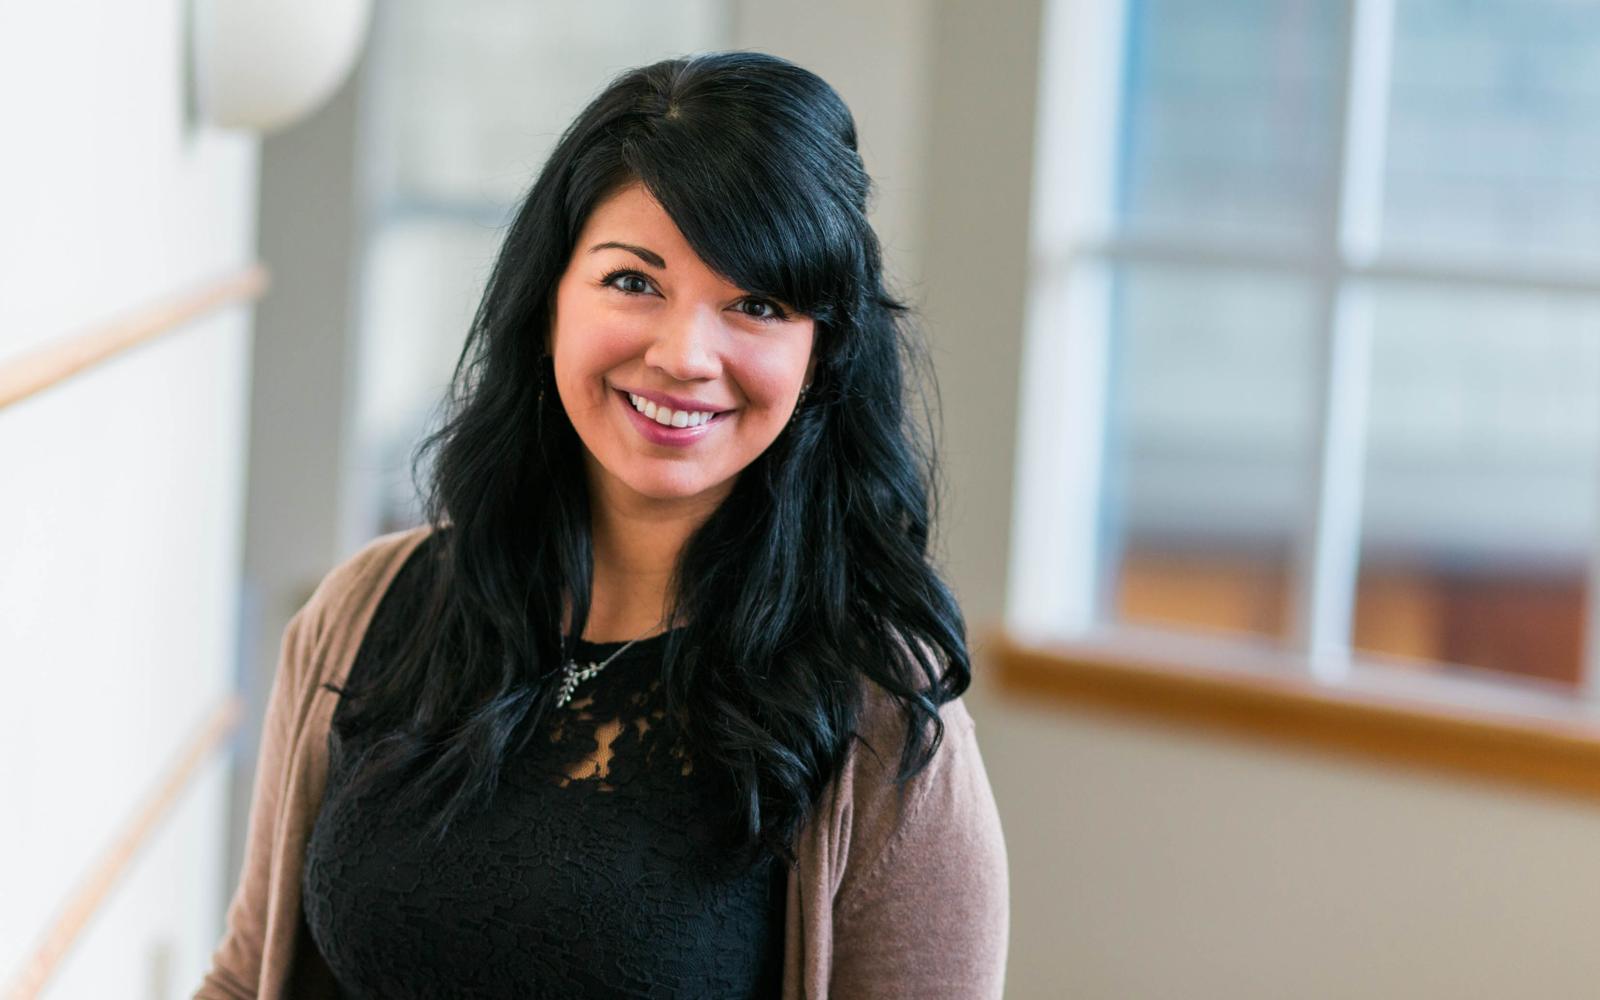 Bachelor of Social Work (BSW) Student, Sarah Lawrence